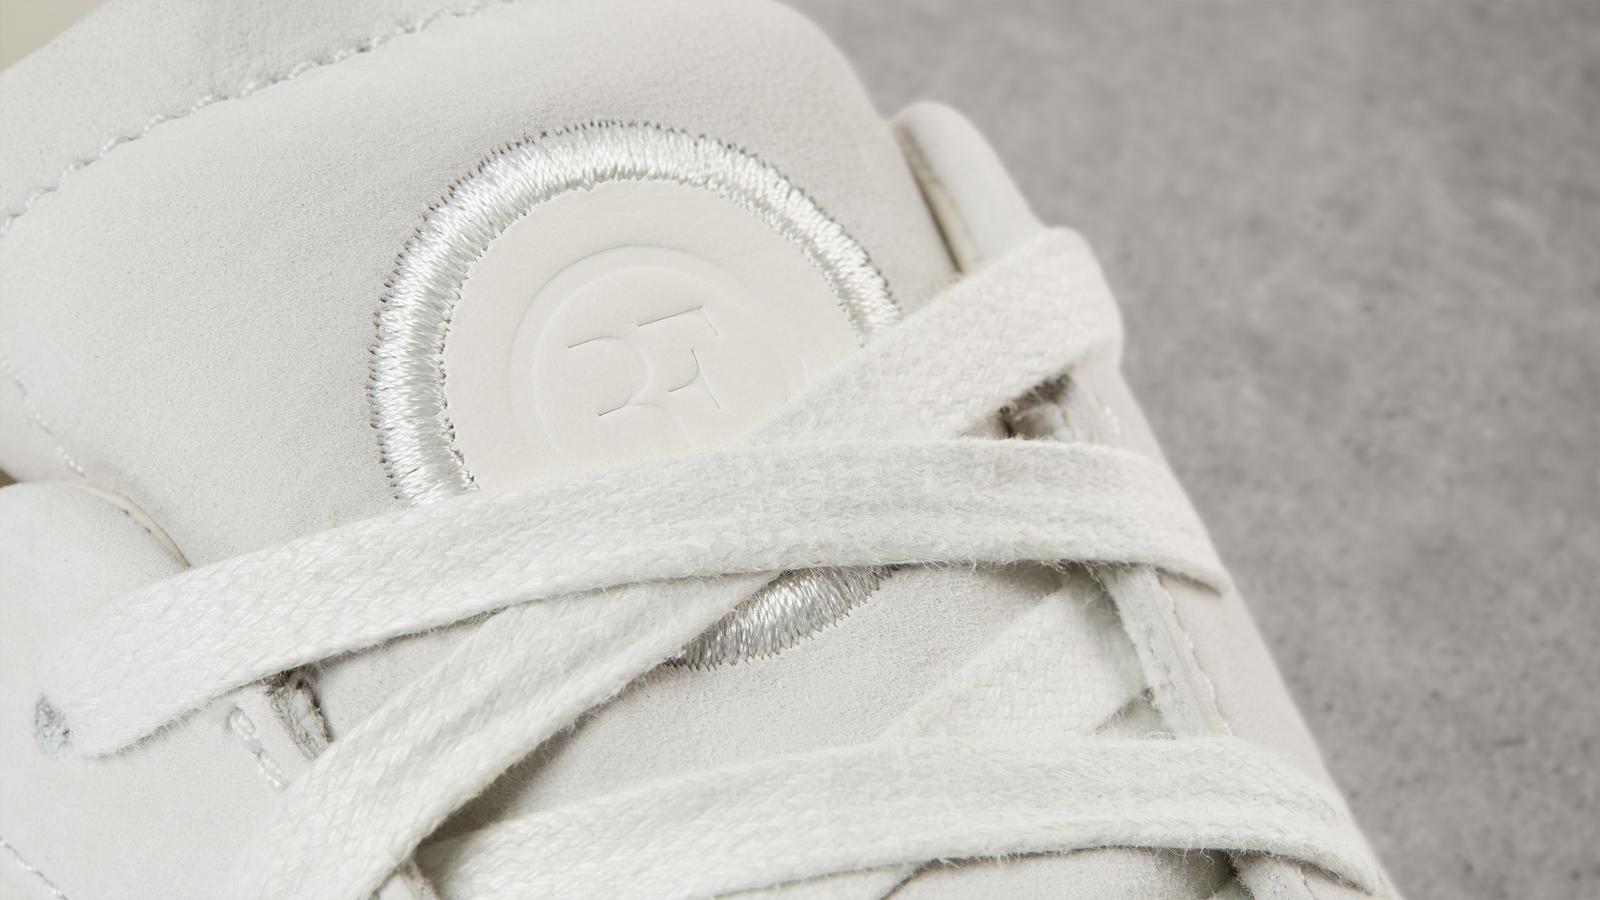 NikeLab Oscillate Evolve RF 1